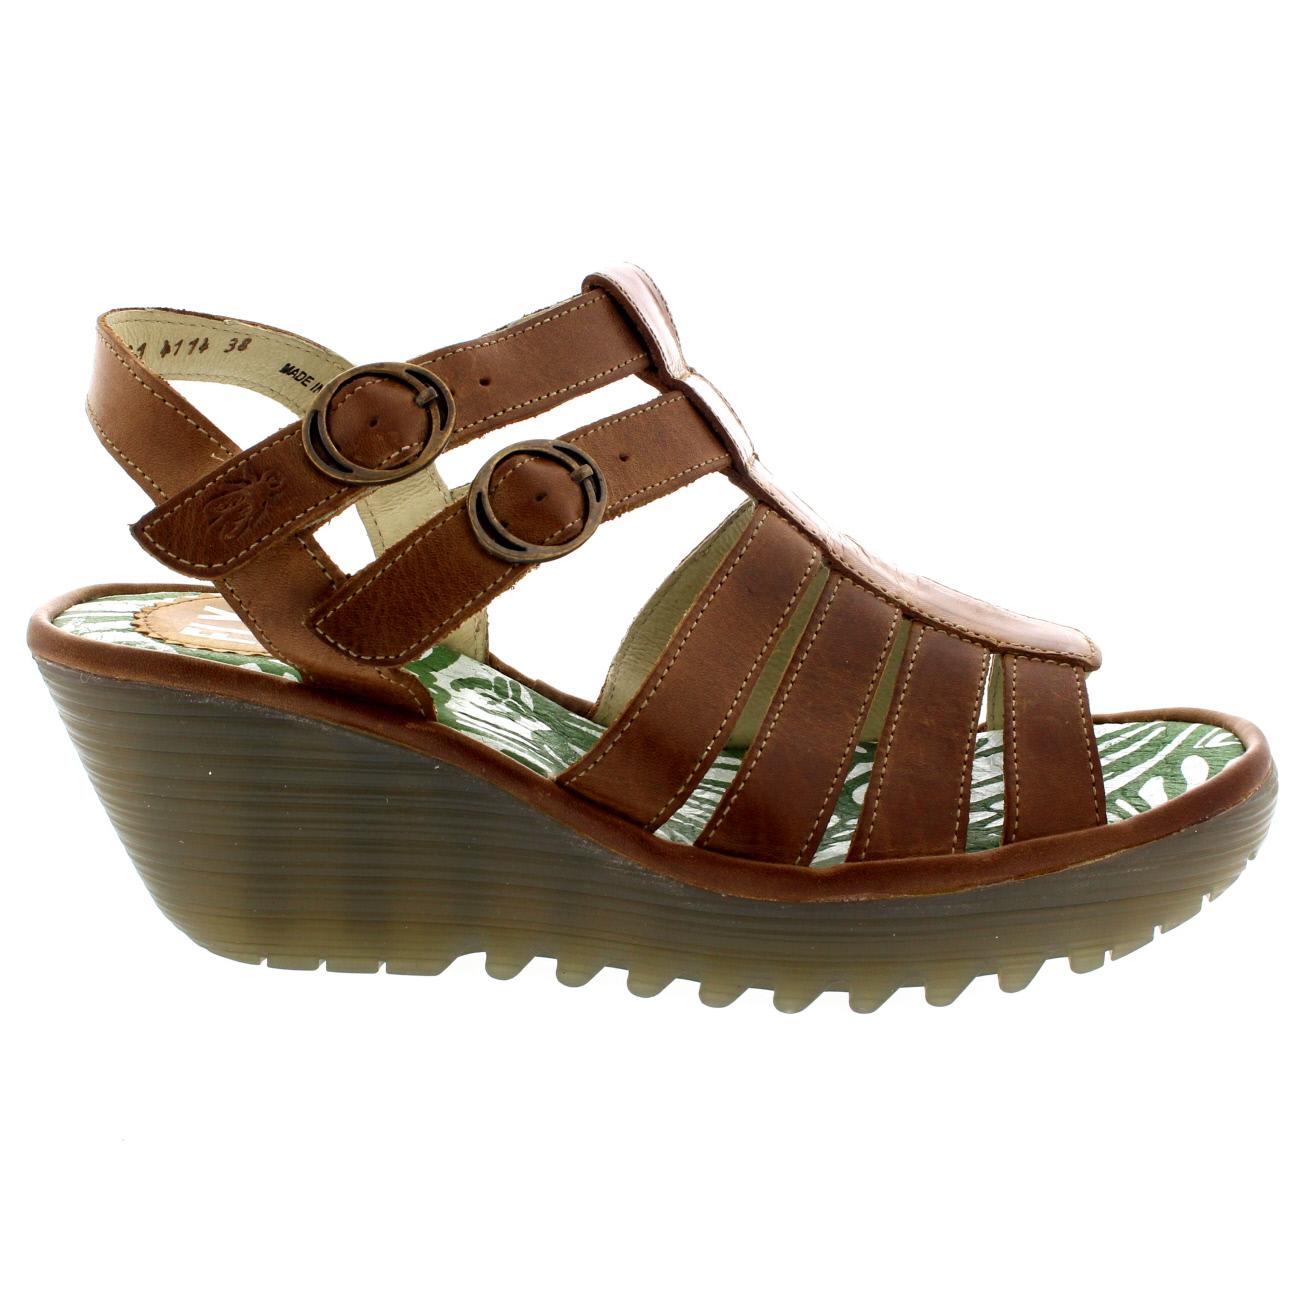 Damenschuhe Fly London Ygor Rug Leder Gladiator ... Summer Wedge Heel ... Gladiator 935761